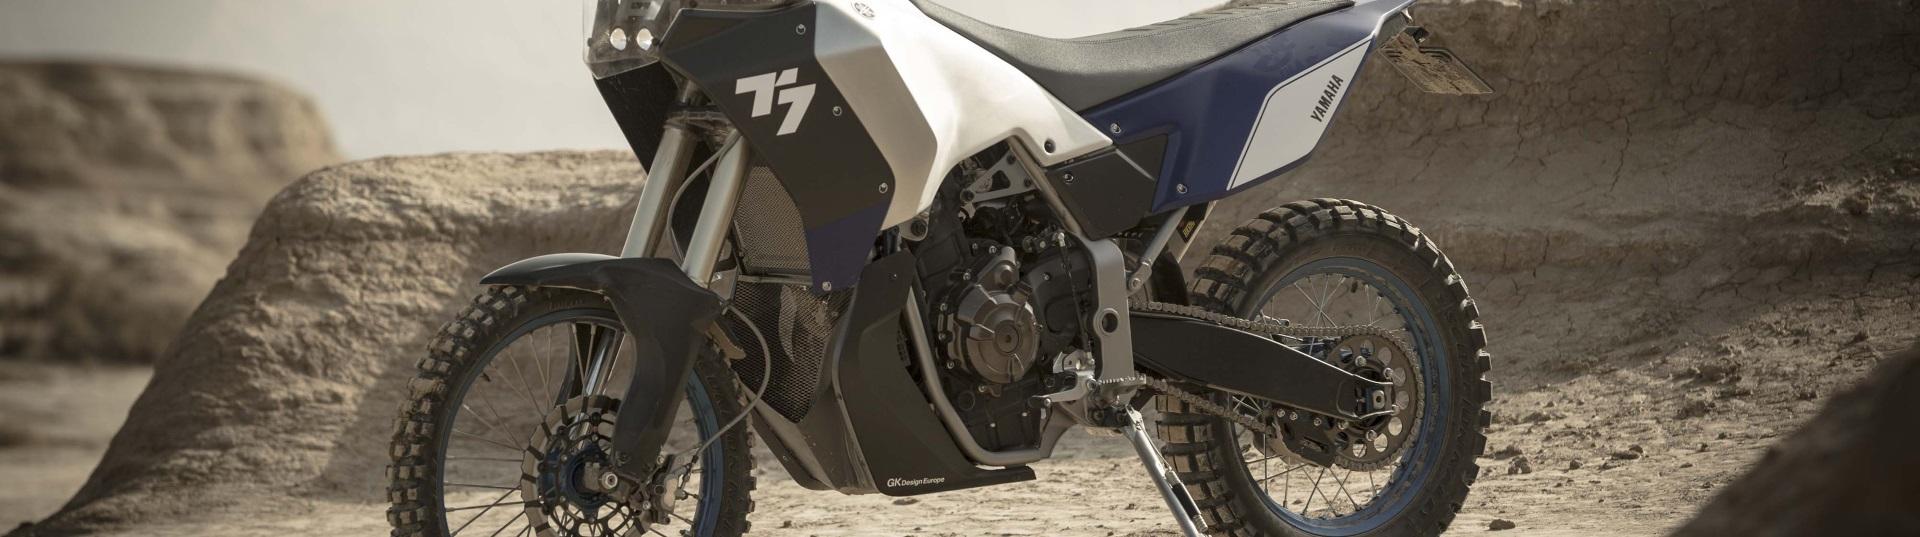 Yamaha T7_Concept